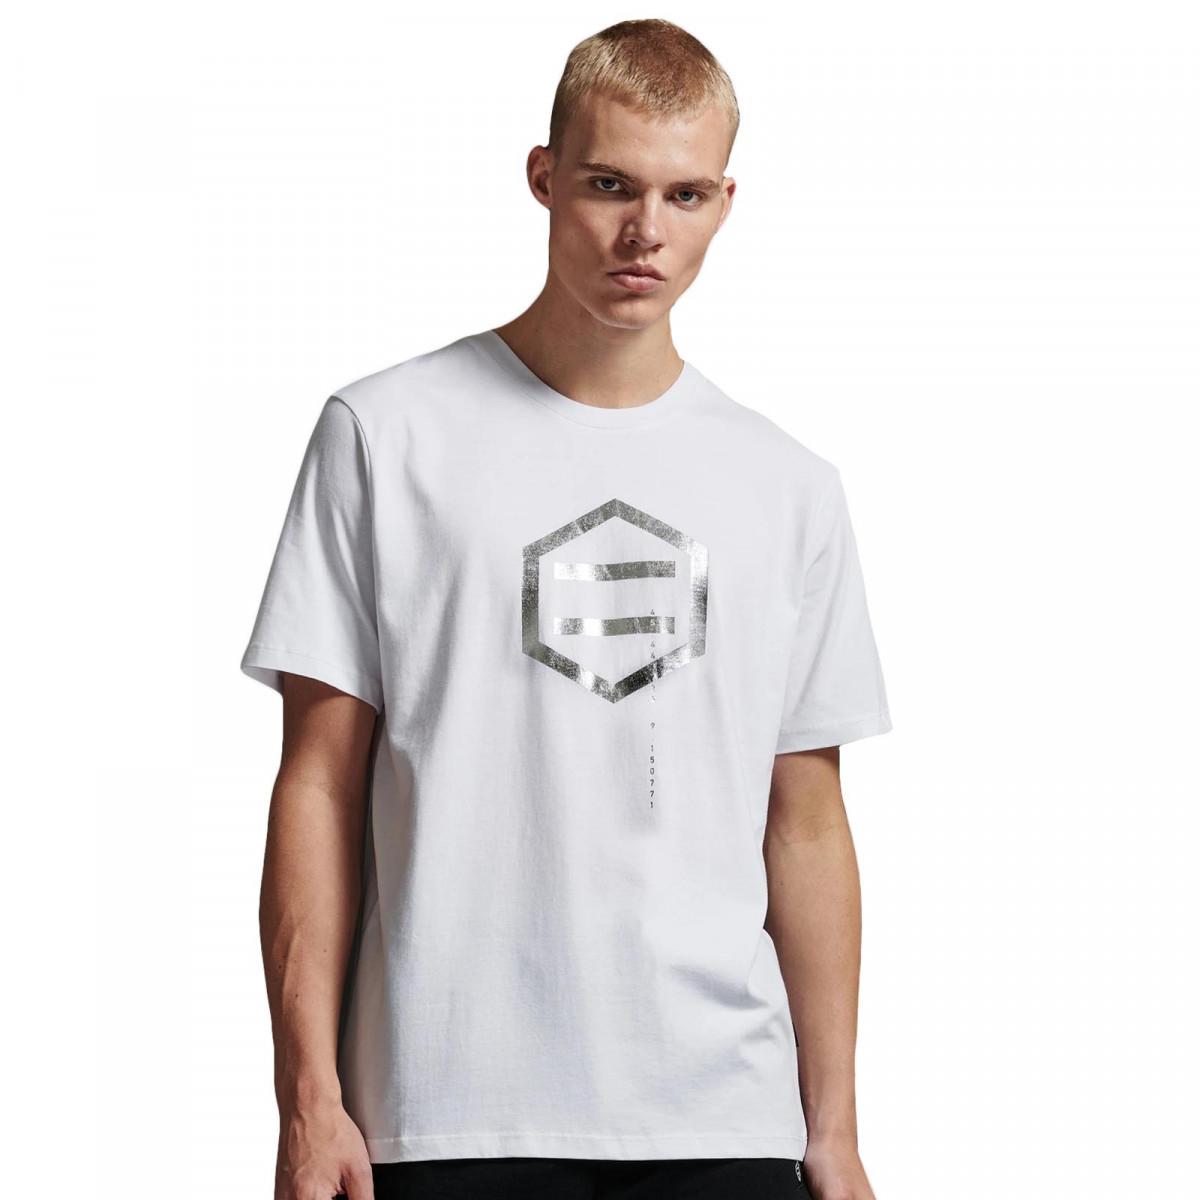 T-Shirt Dolly Noire Hexagon White & Chromo